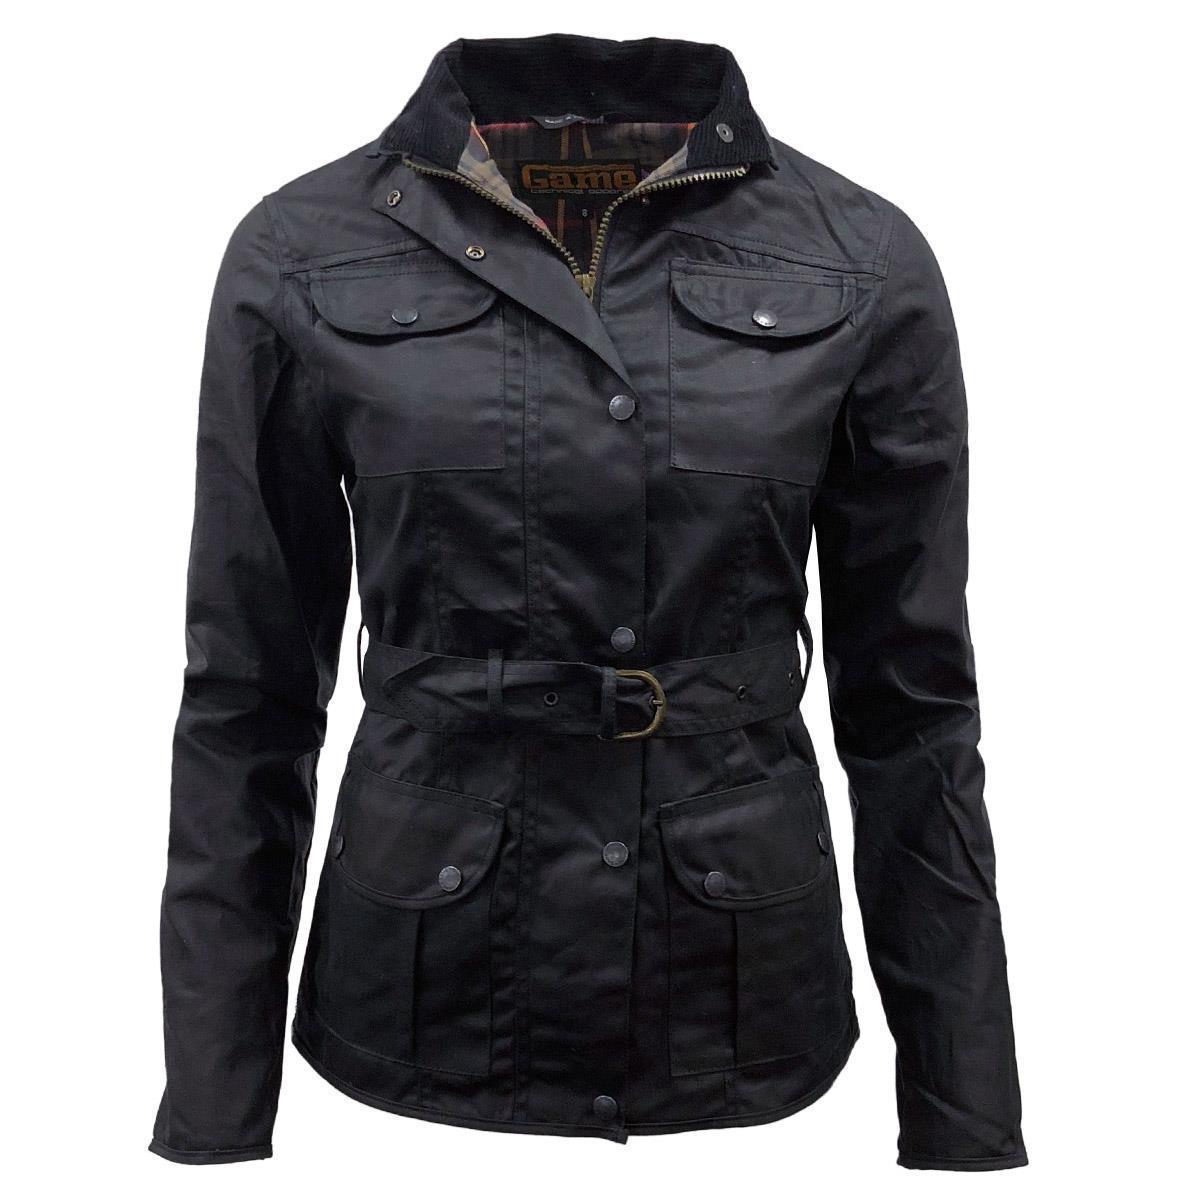 Game Technical Apparel Women's Jacket Morgan Wax - Black 8